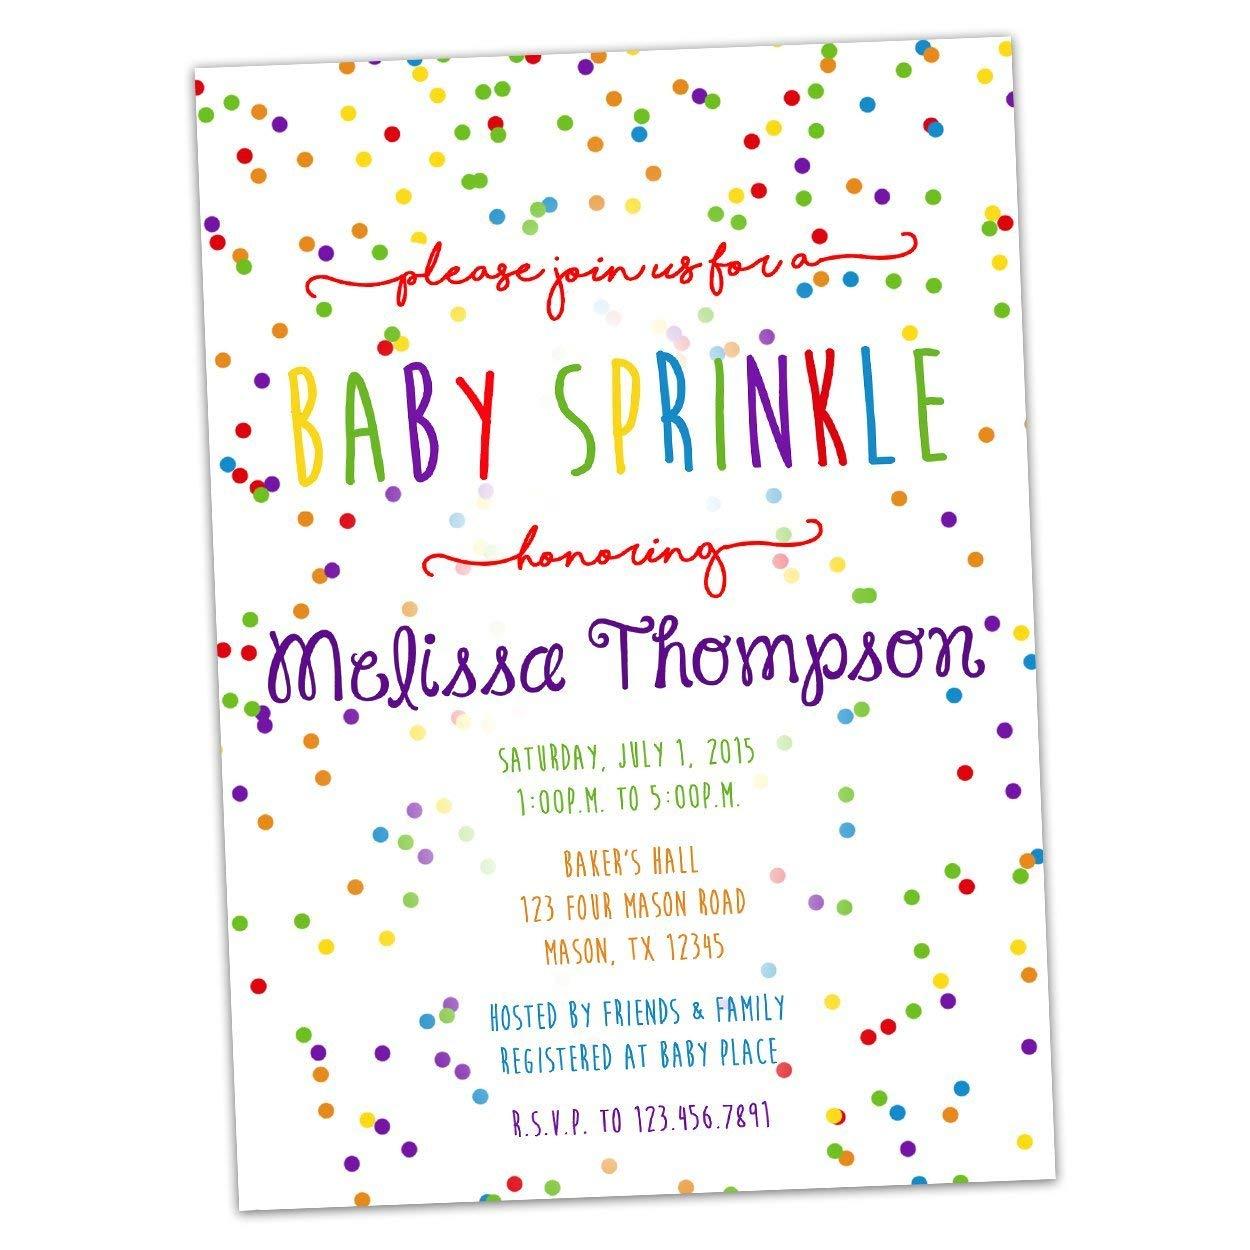 Sprinkle Shower Invite Matching Envelope Liner Confetti Invite Sprinkle Invite Matching Envelope Inserts Sprinkle Invitation